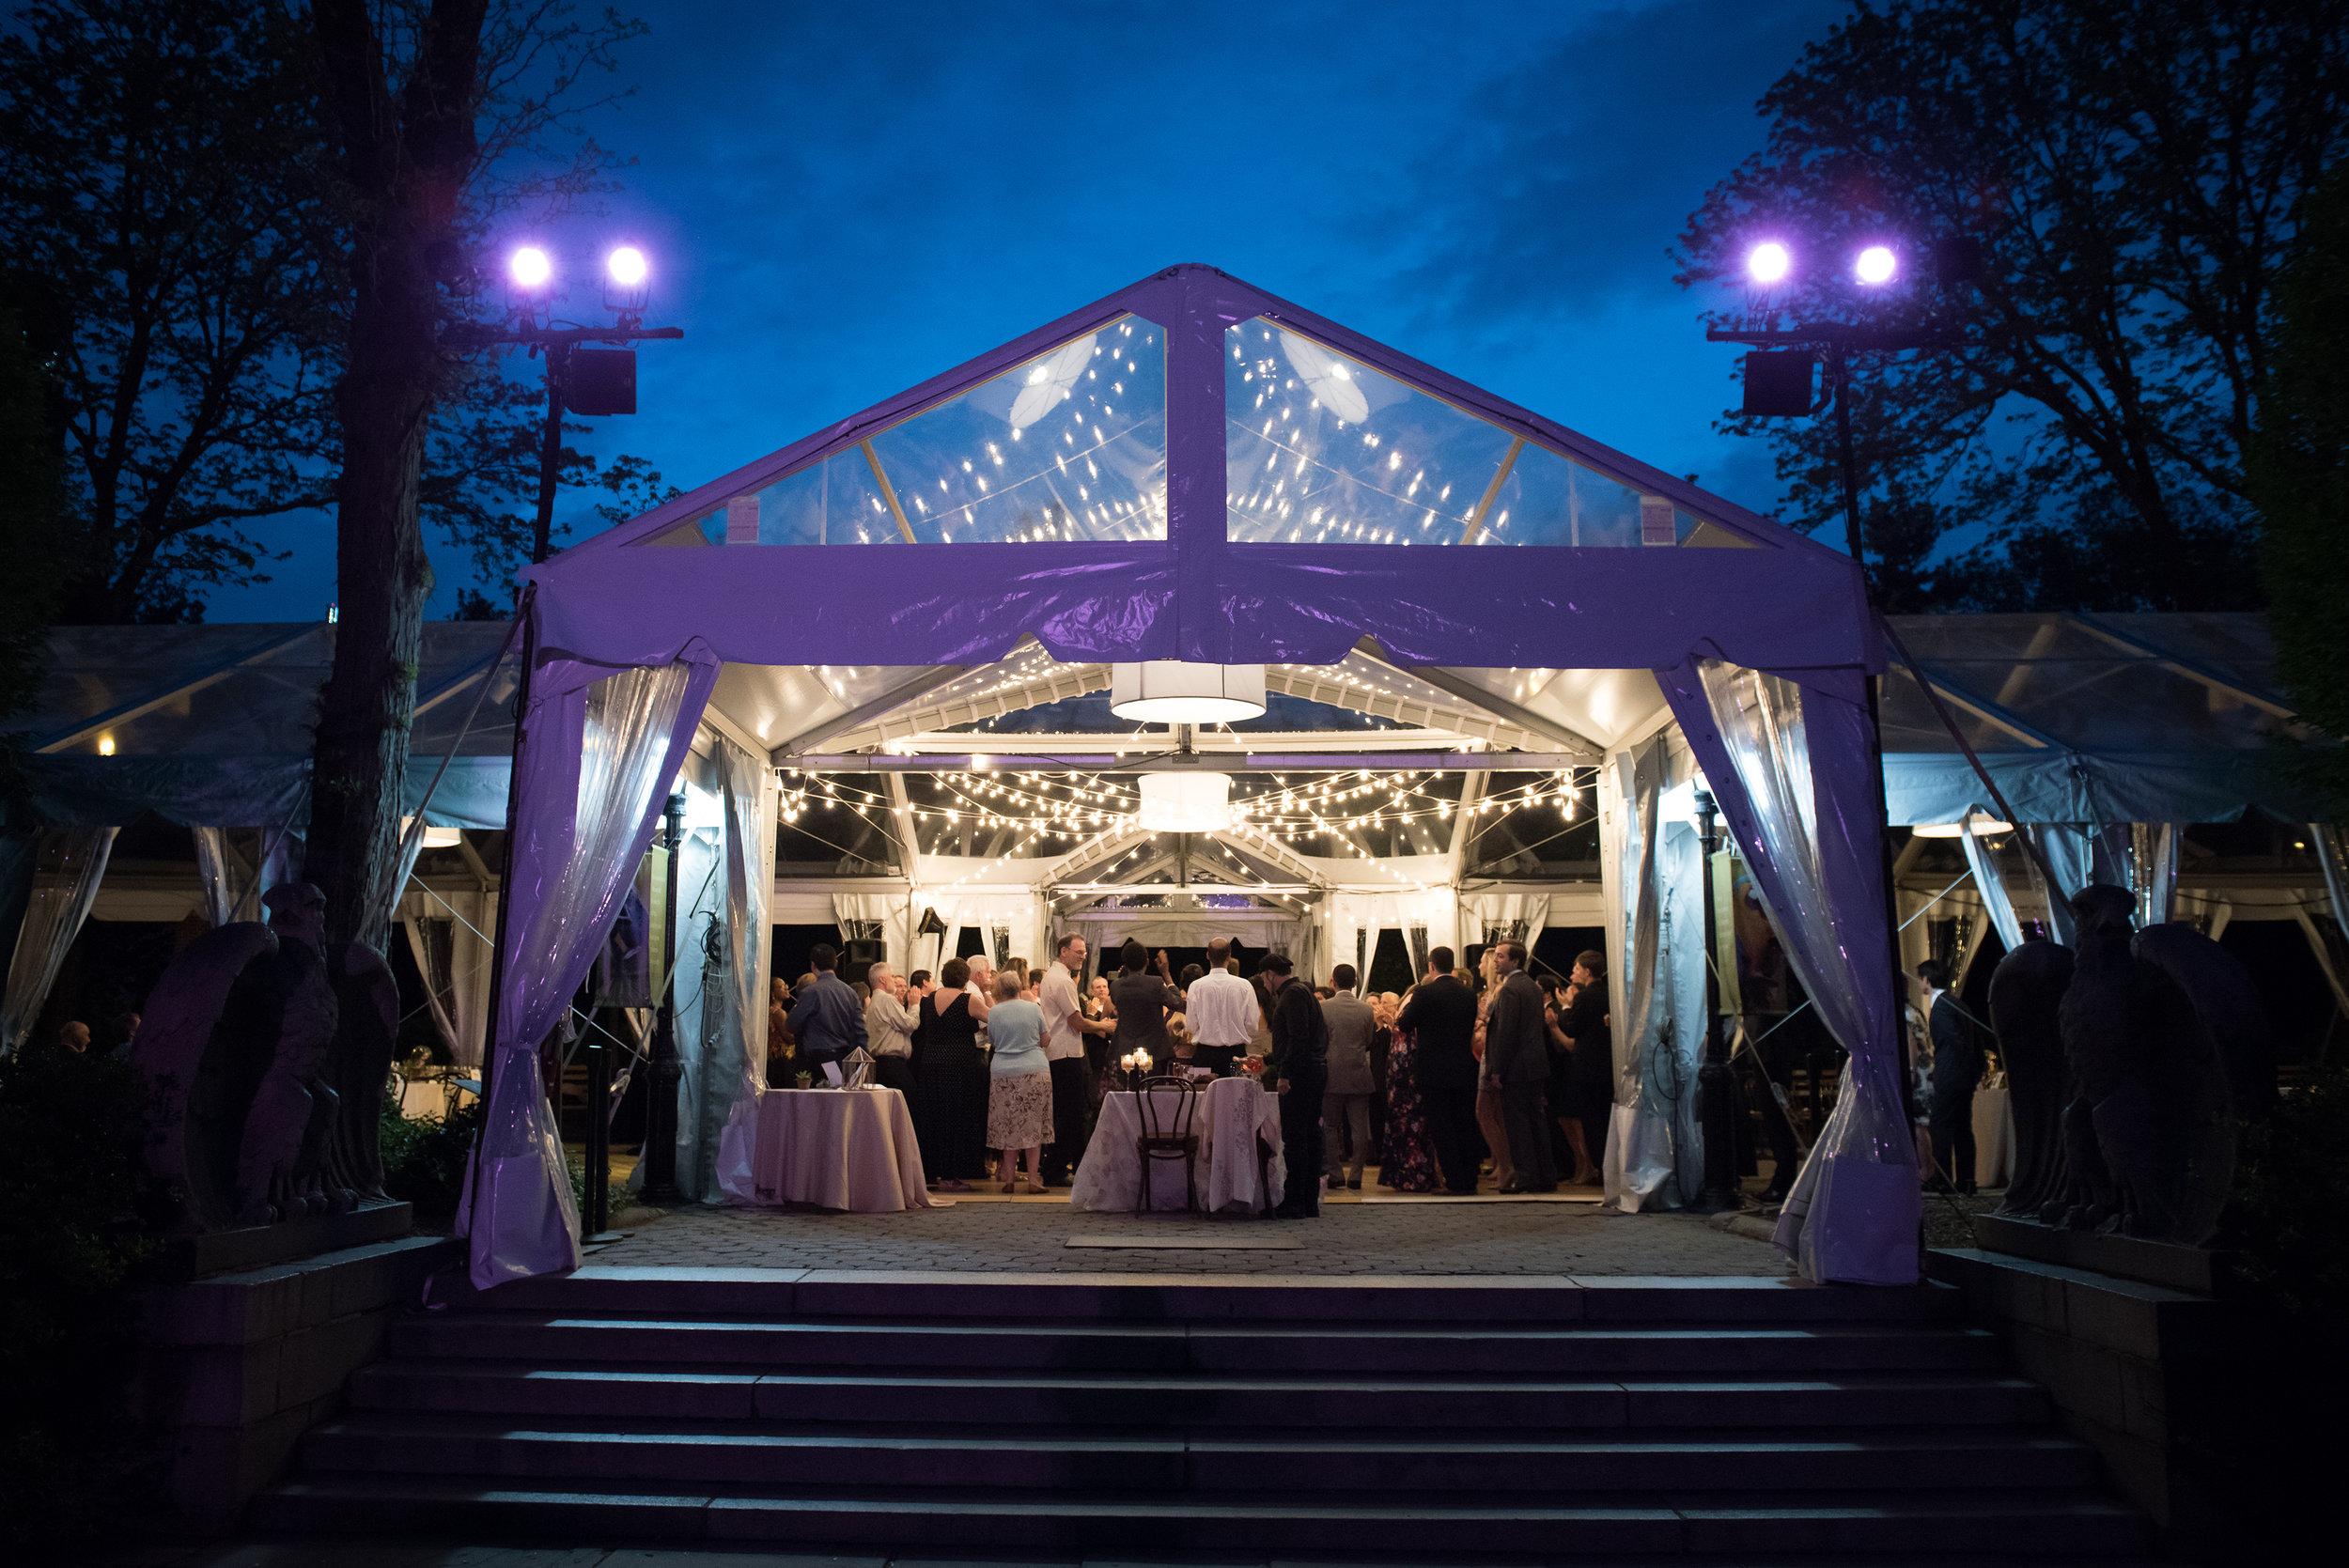 victorious-events-nyc-032-colleen-taka-central-park-zoo-wedding-raymond-hamlin.jpg